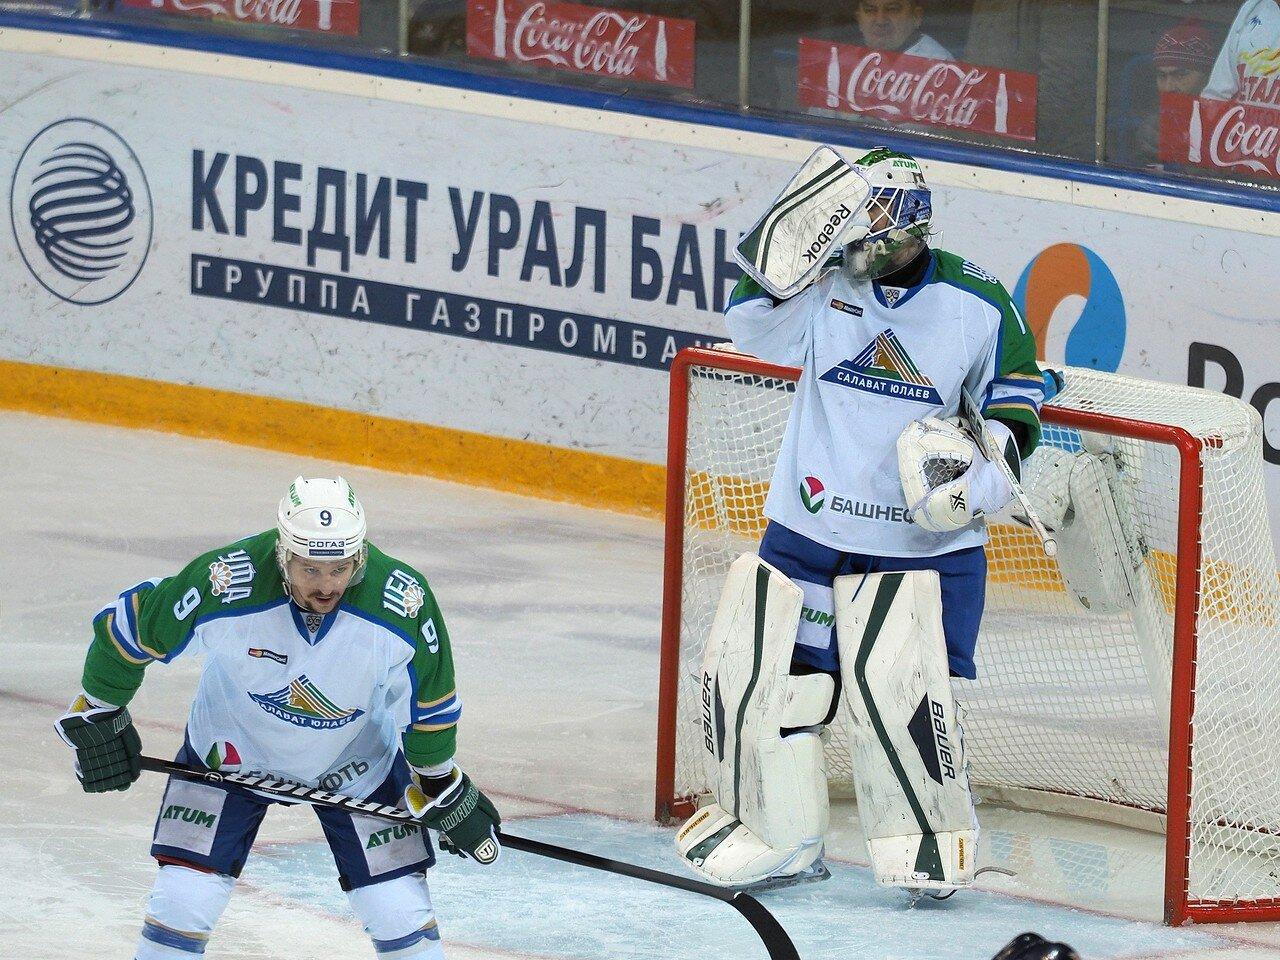 63Плей-офф 2016 Восток Финал Металлург - Салават Юлаев 31.03.2016